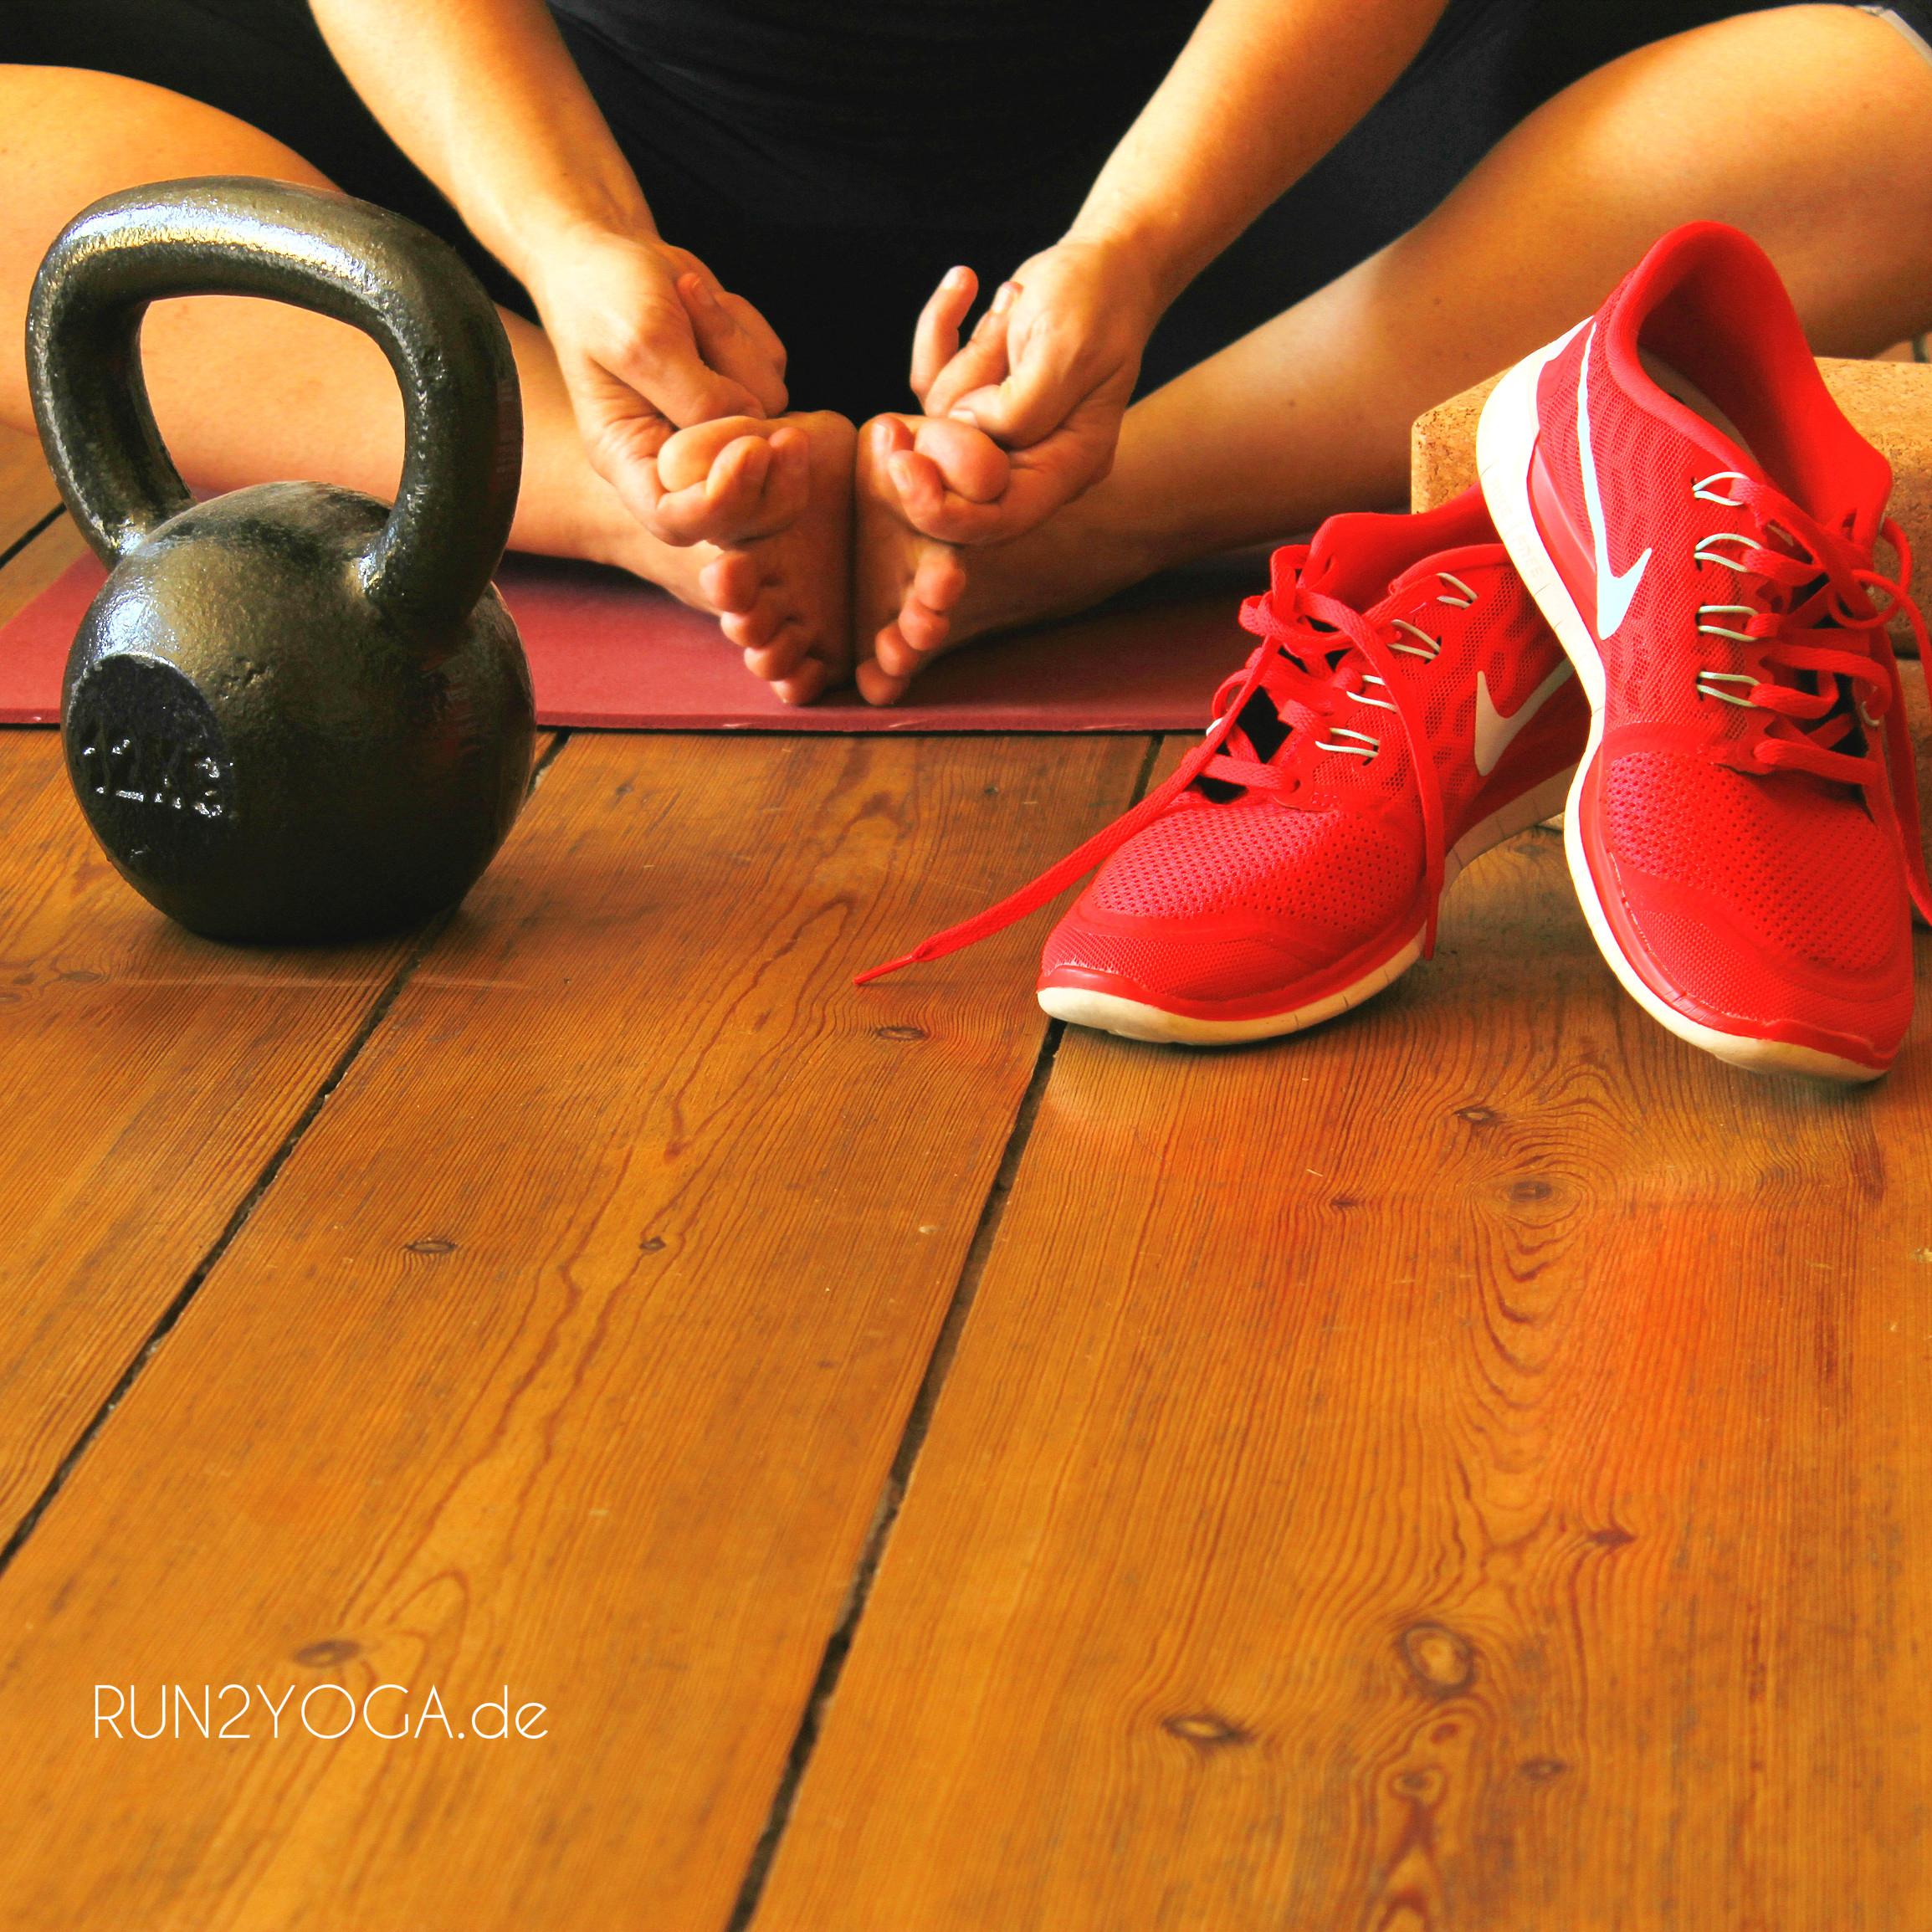 RUN2YOGA - Yoga und Laufen